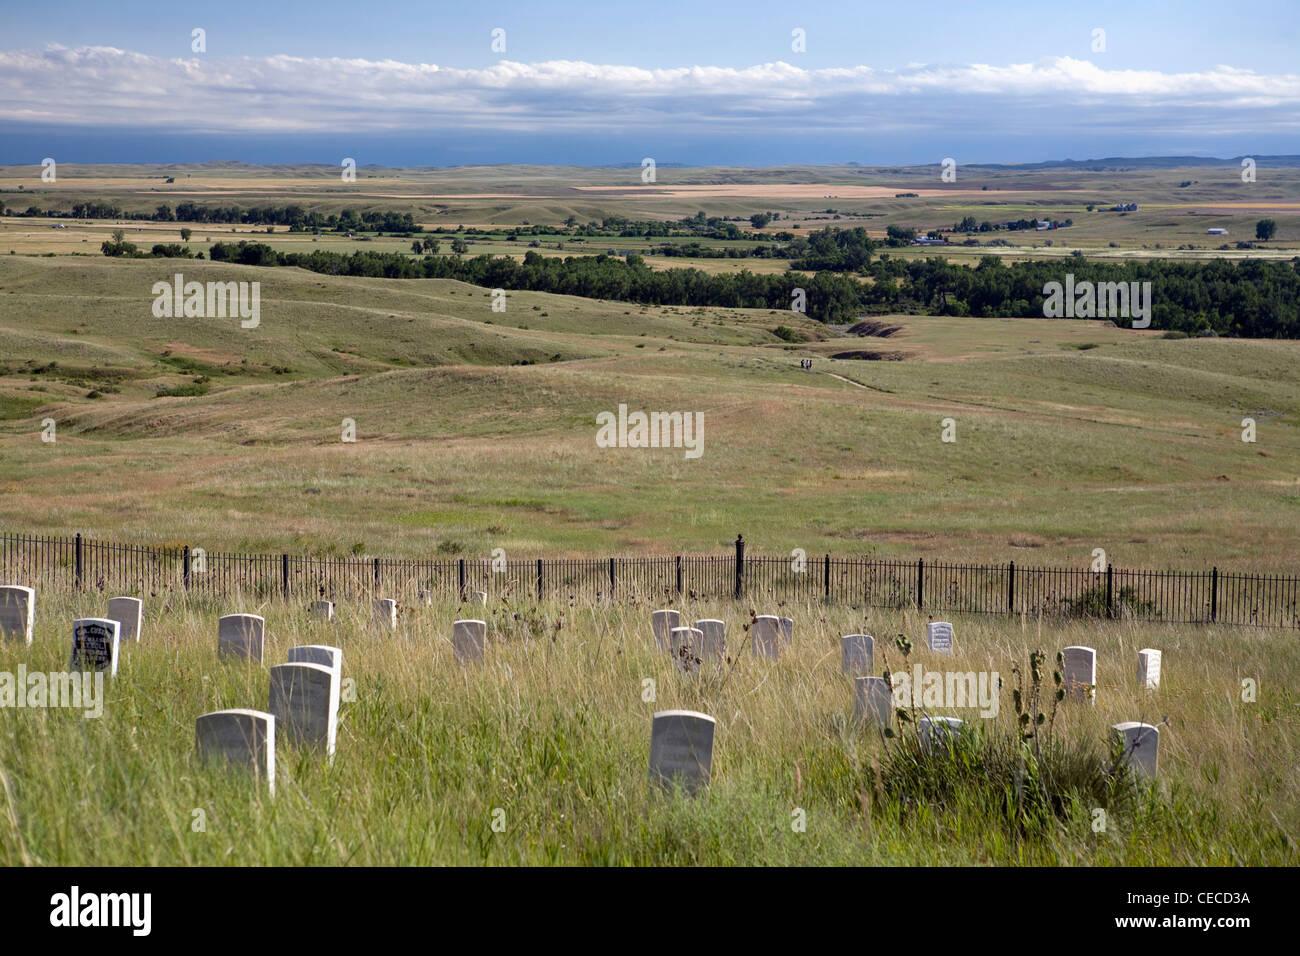 Little Big Horn Battefield National Monument, Montana. Stock Photo